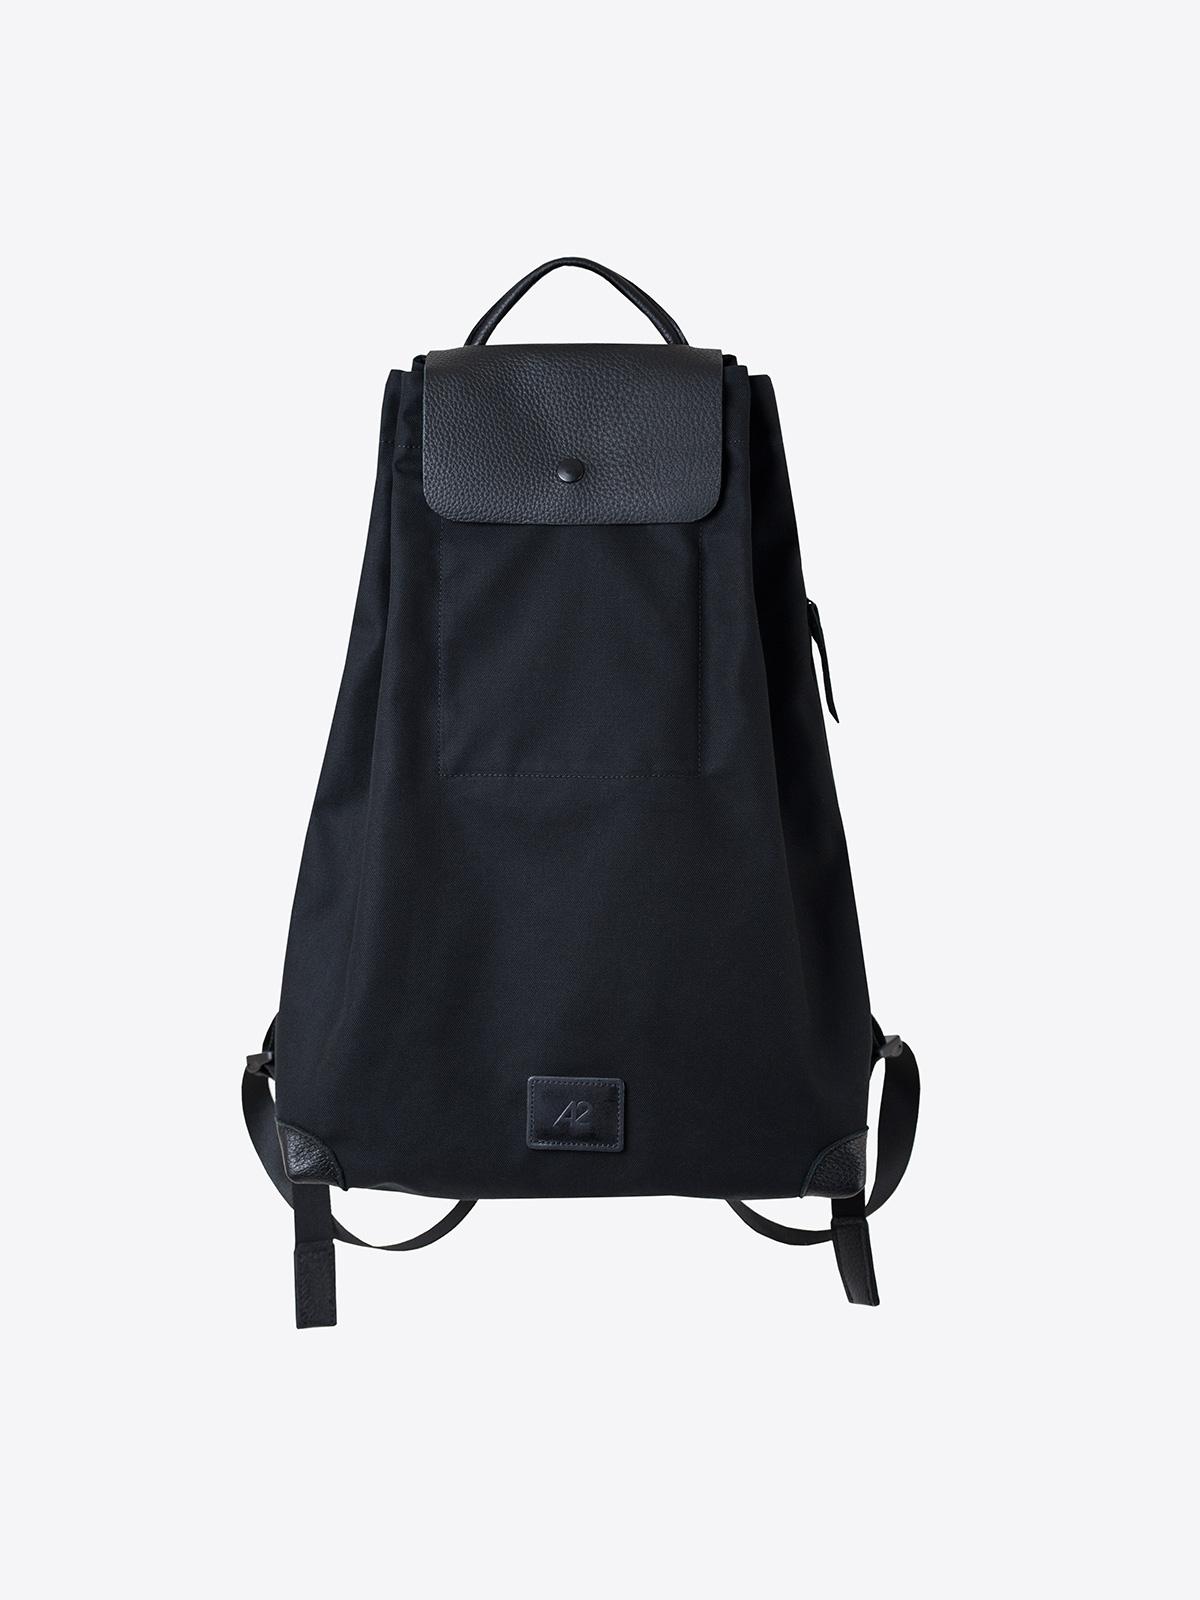 A2 black